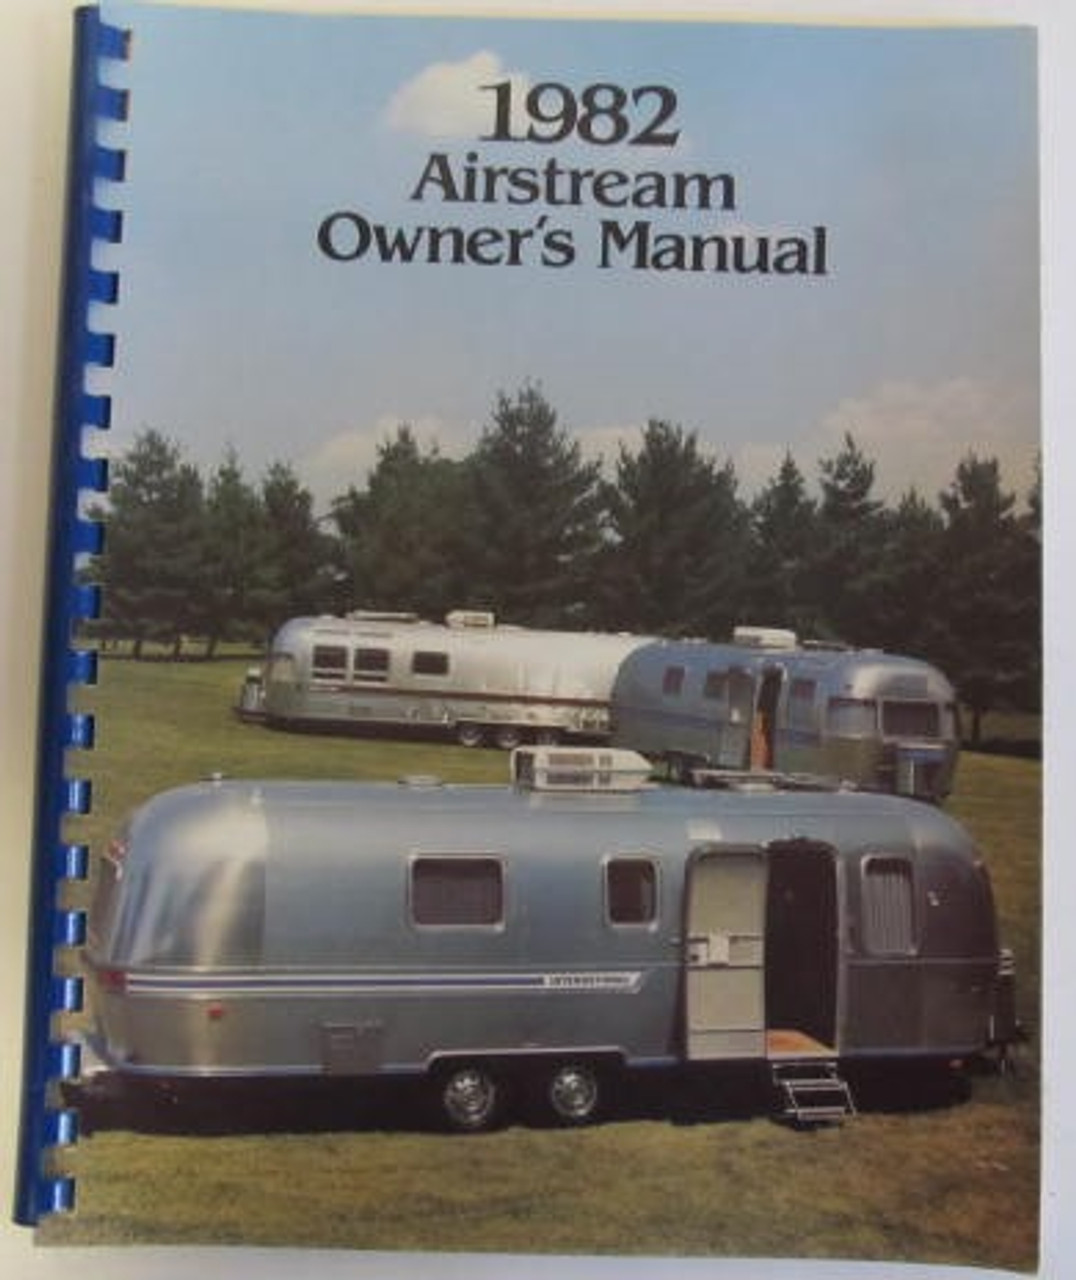 1982 Airstream Owner's Manual (BL003)